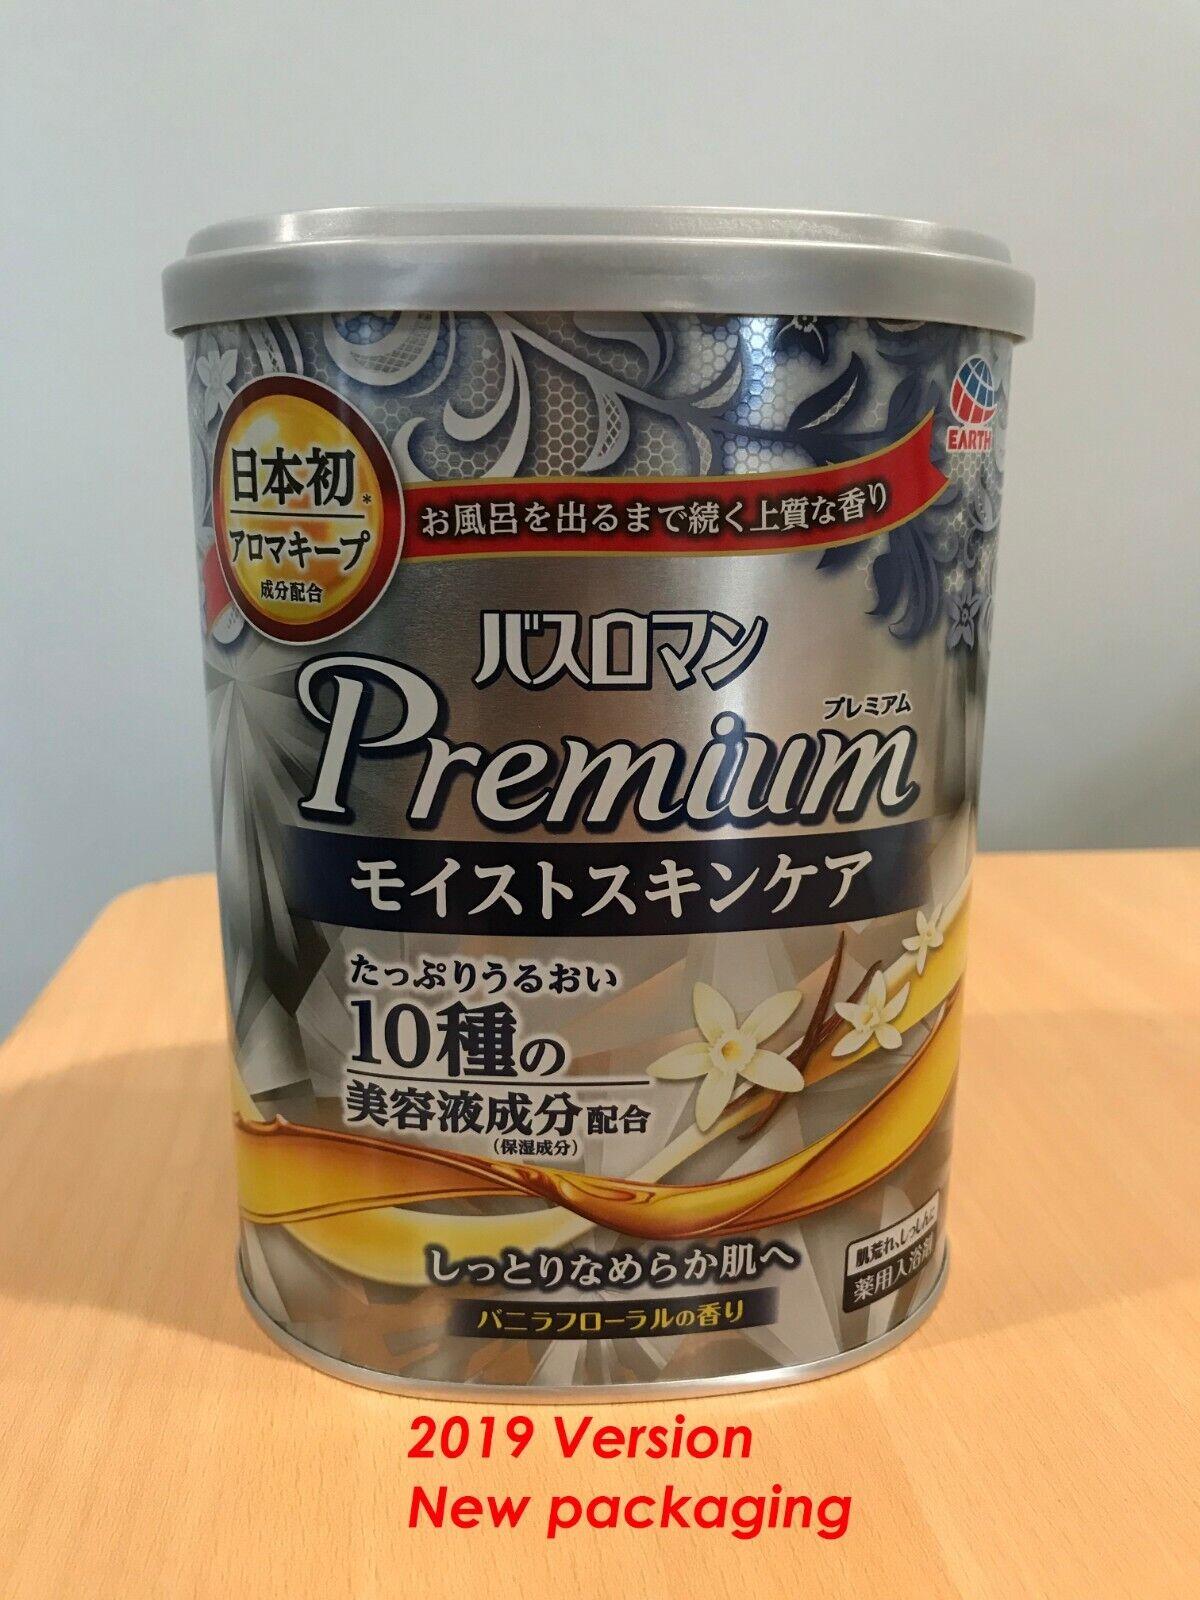 Japanese BATH ROMAN PREMIUM Skin Care Vanilla Floral Aroma S